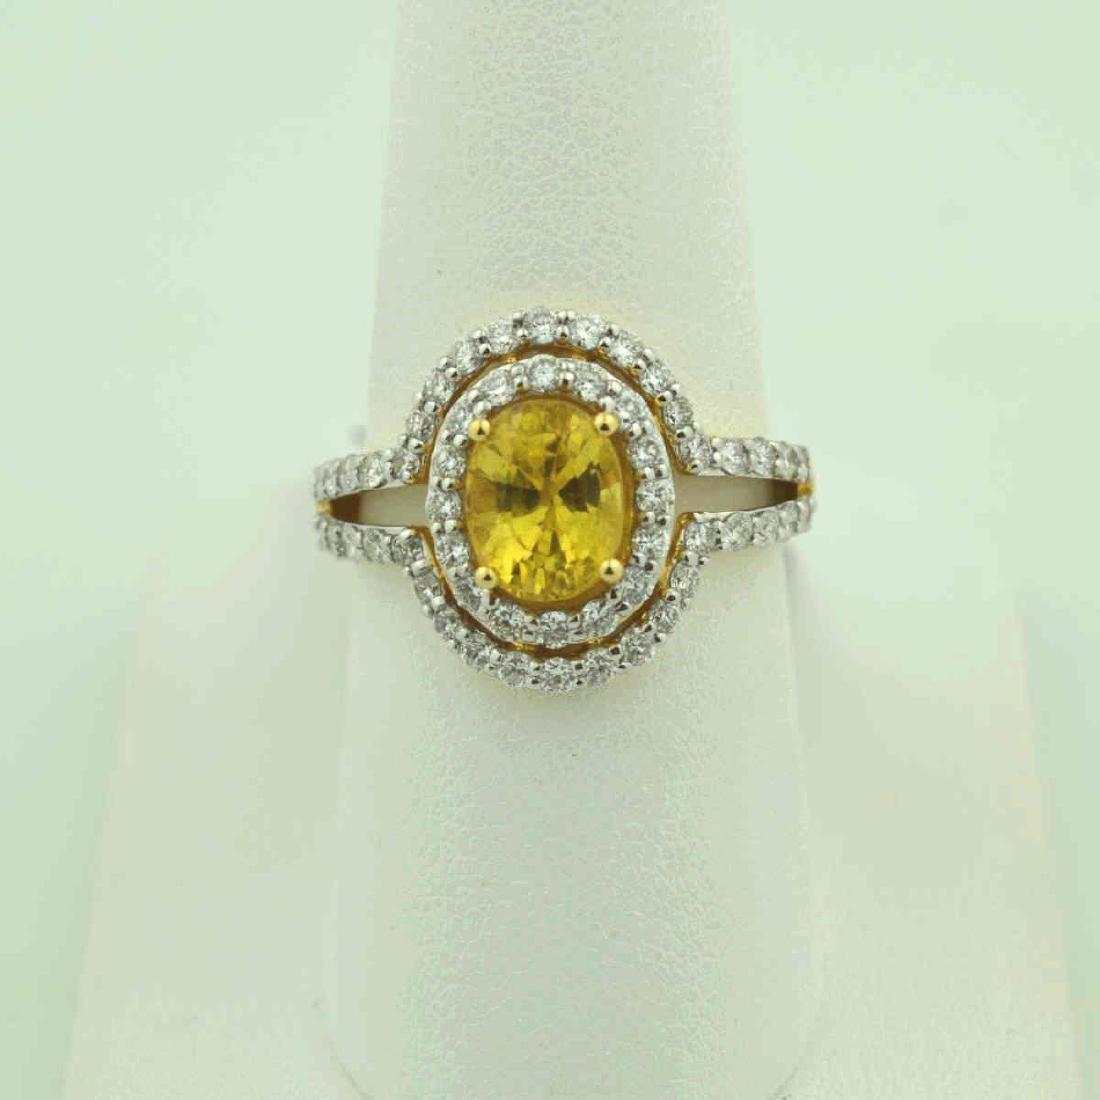 18kt yellow gold yellow sapphire ring